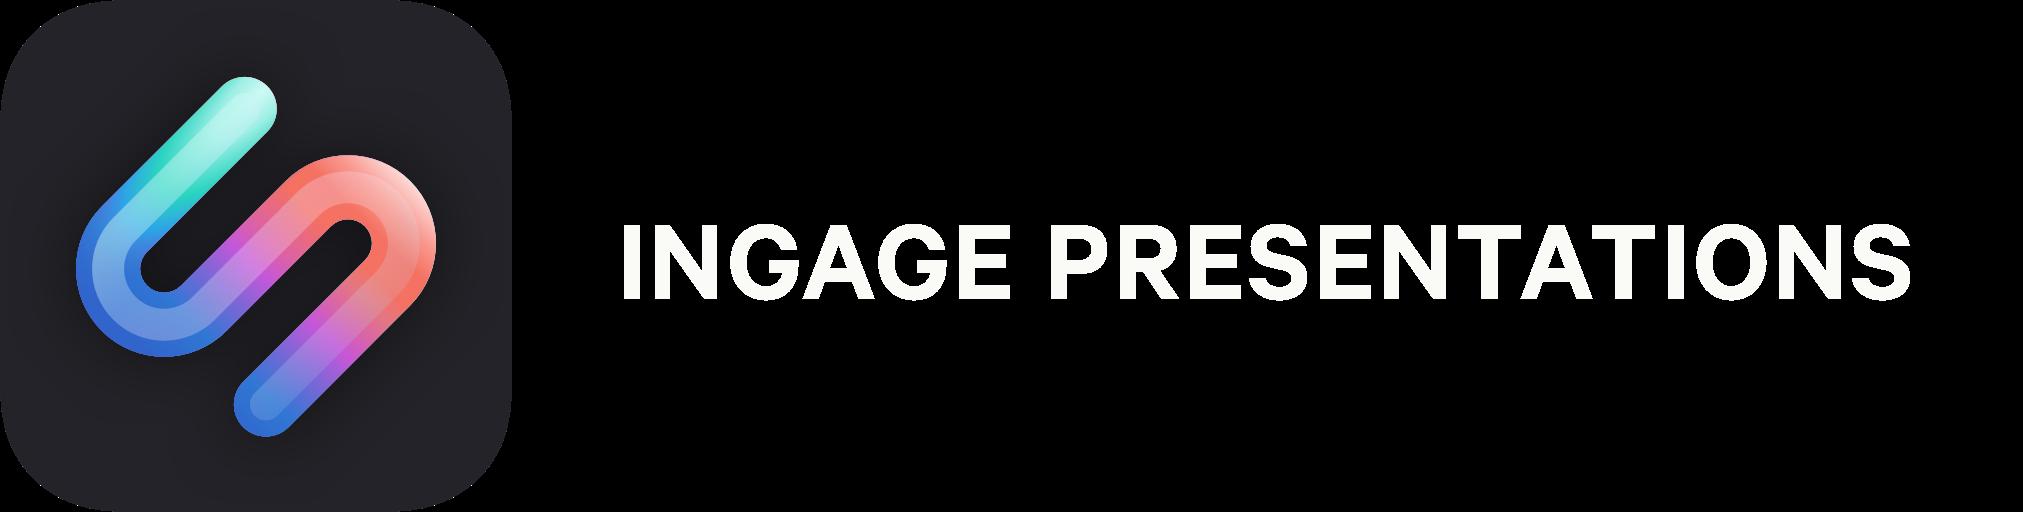 Presentations_Logo.png